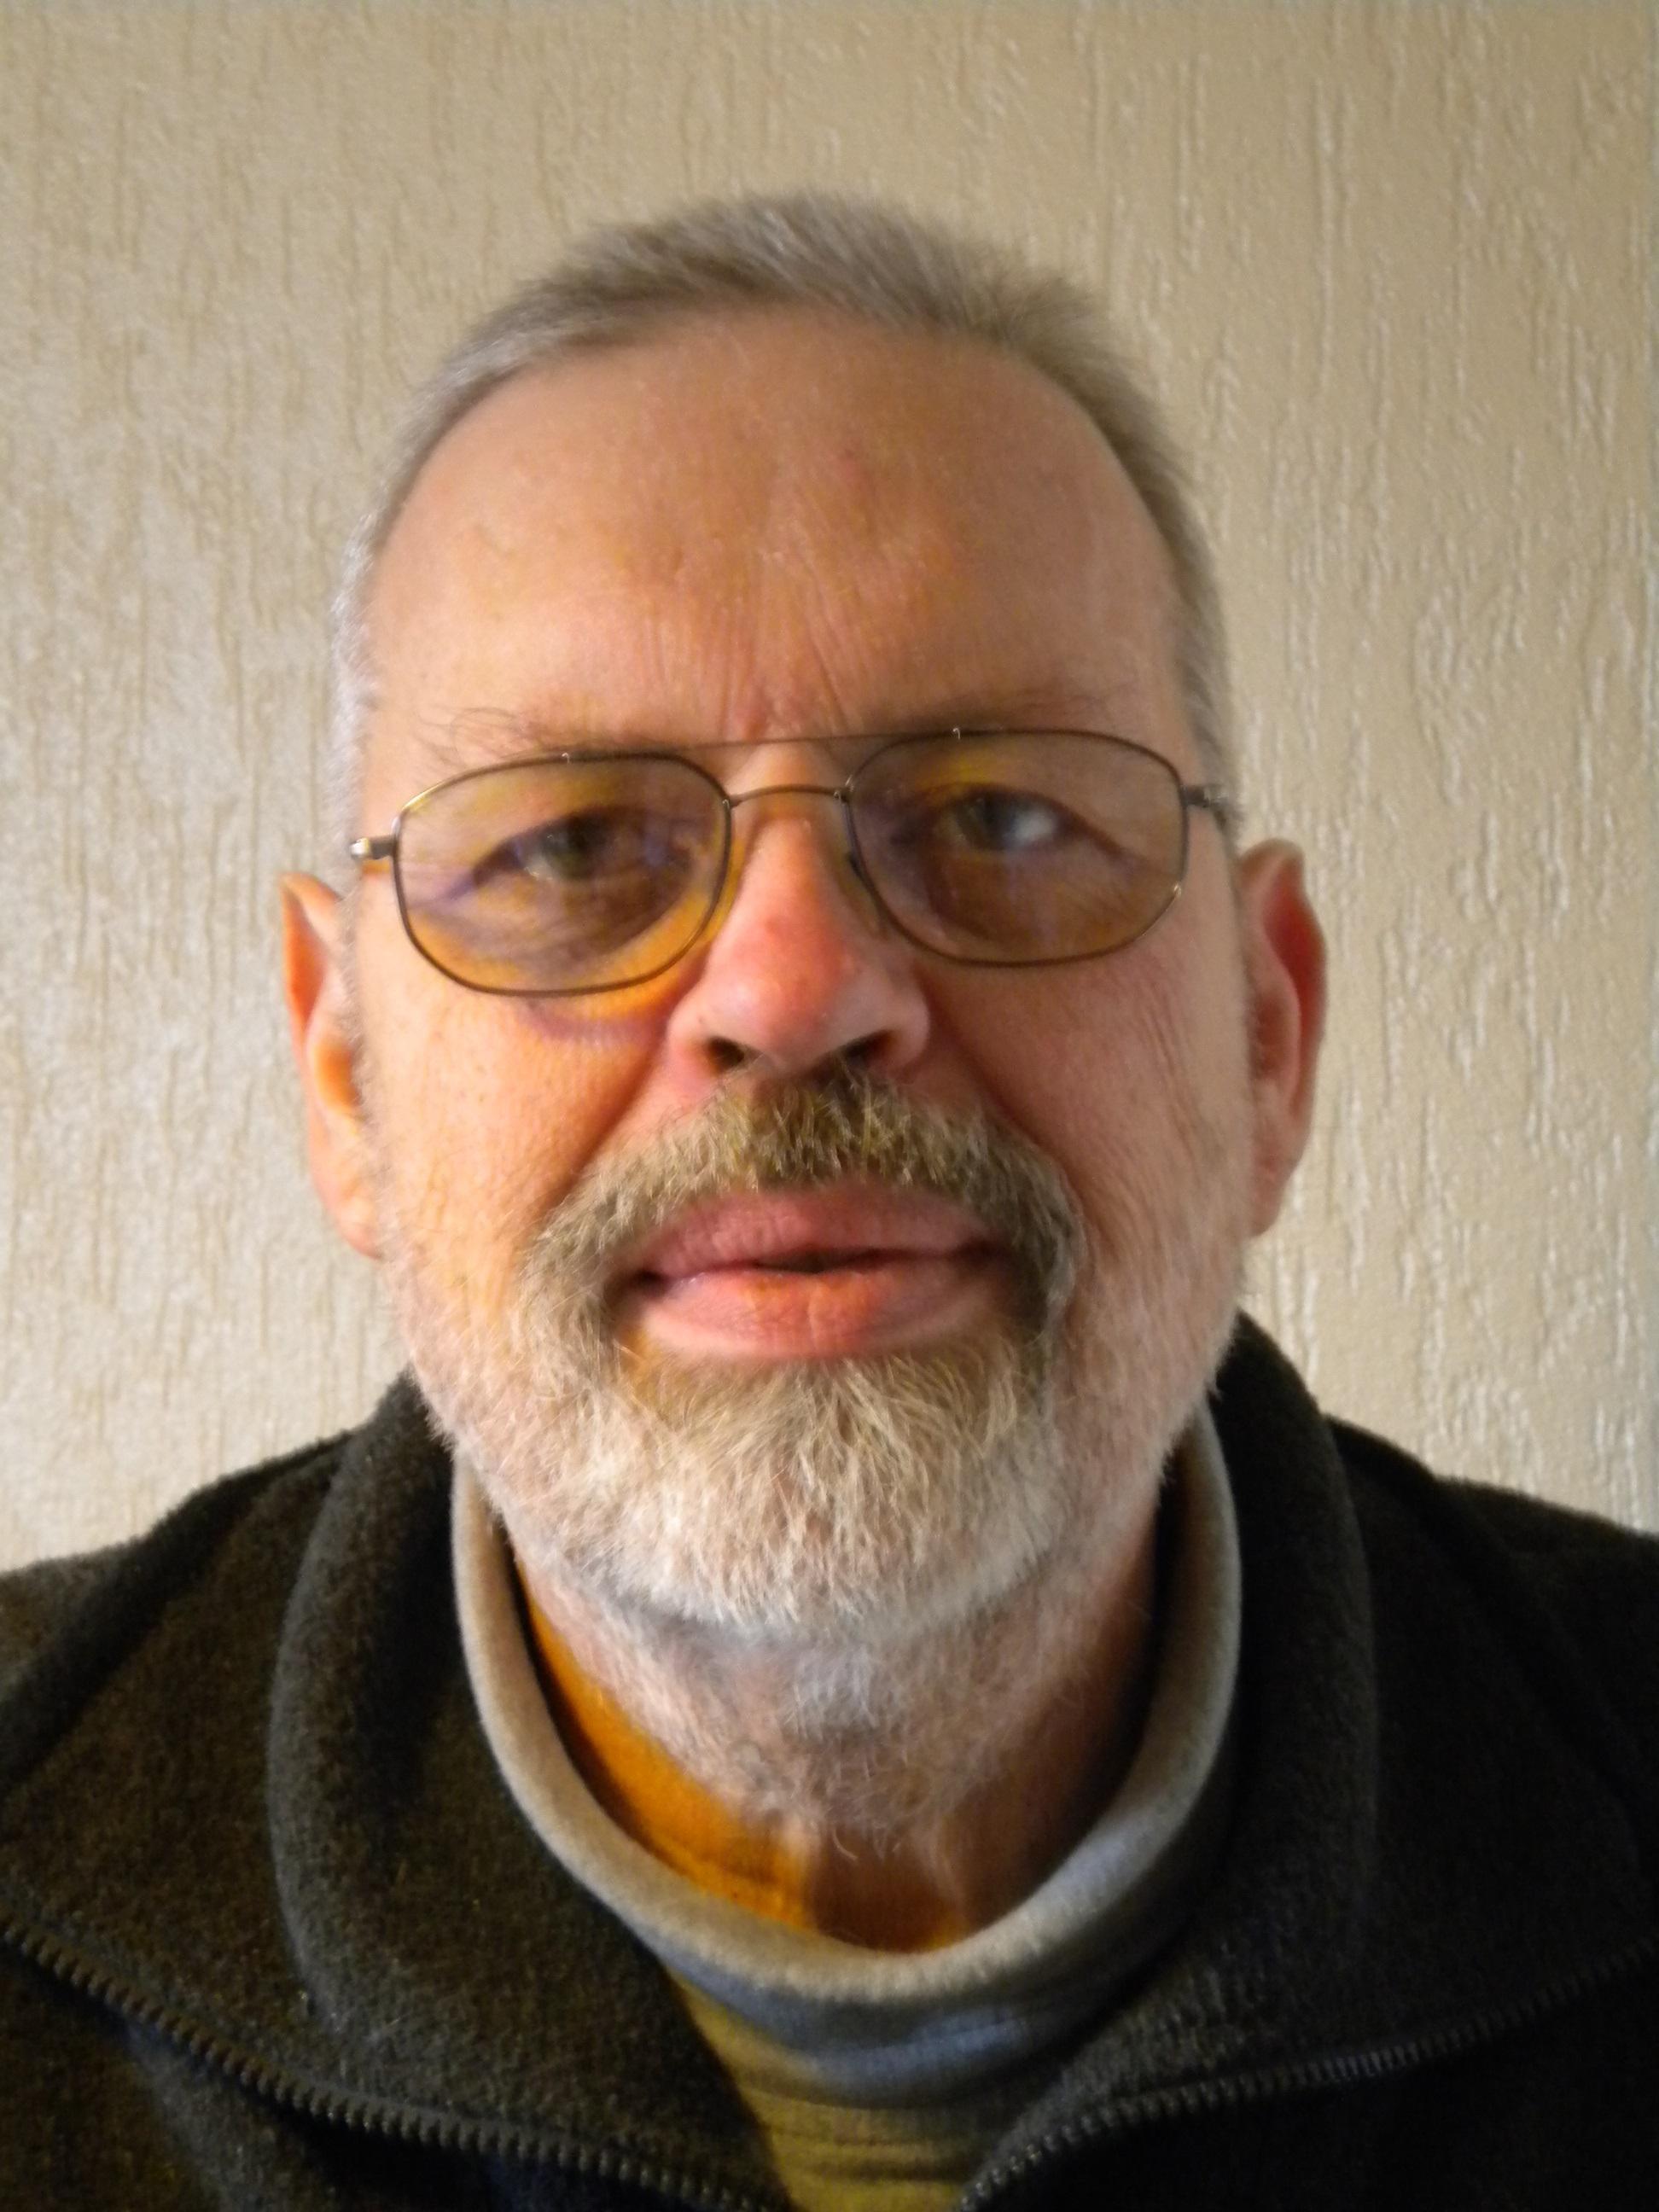 Reinhard Heise